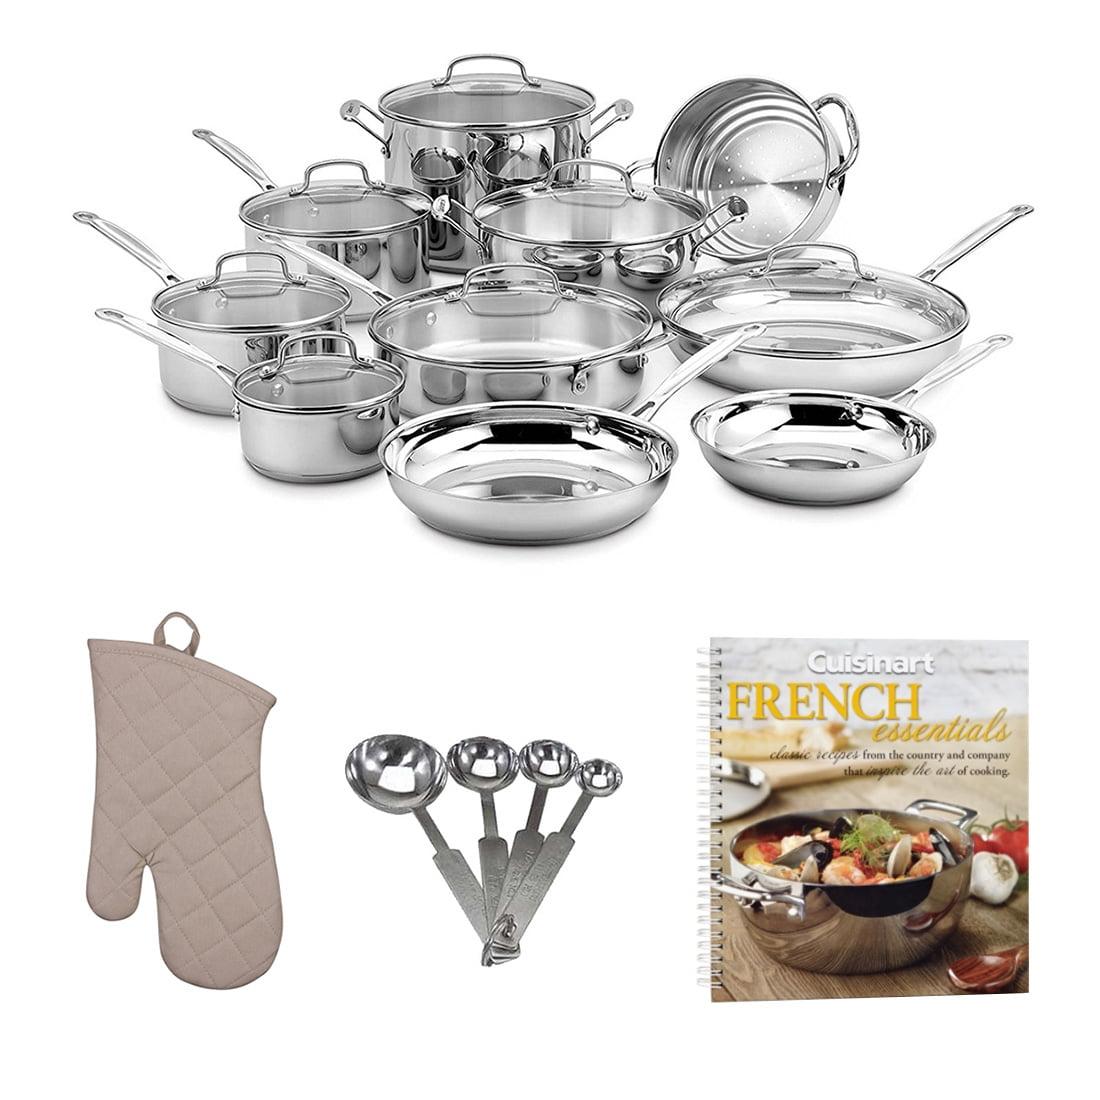 Cuisinart 17-Piece Chef's Classic Cookware Set w/ Cookboo...